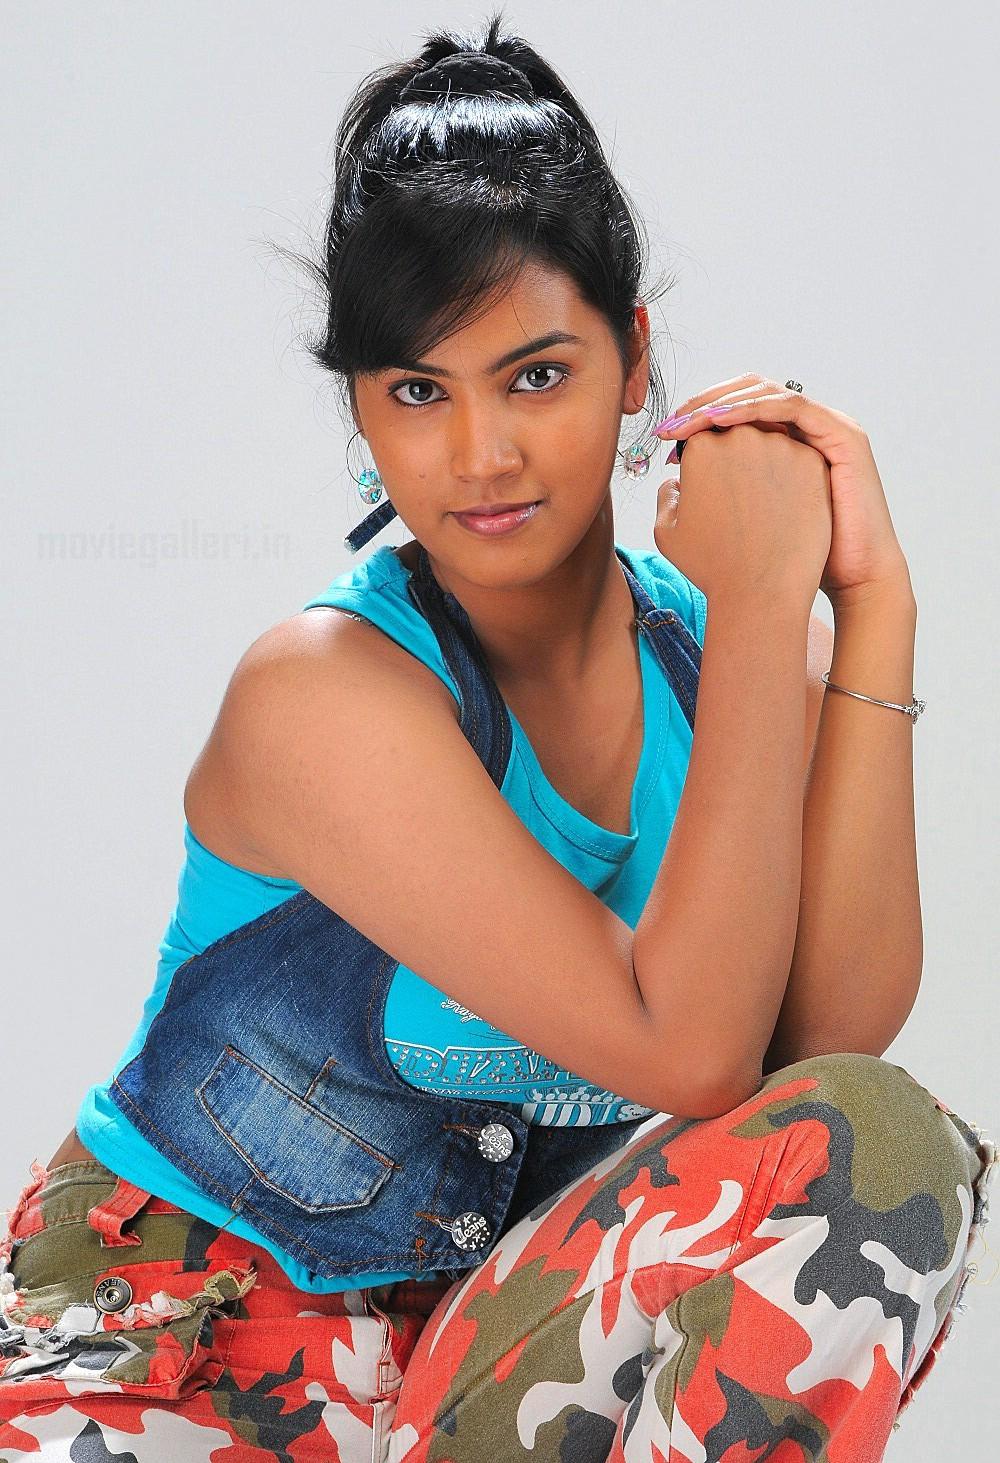 Telugu TV Actress Harika Photo Shoot Stills. Vaishali TV Serial Telugu